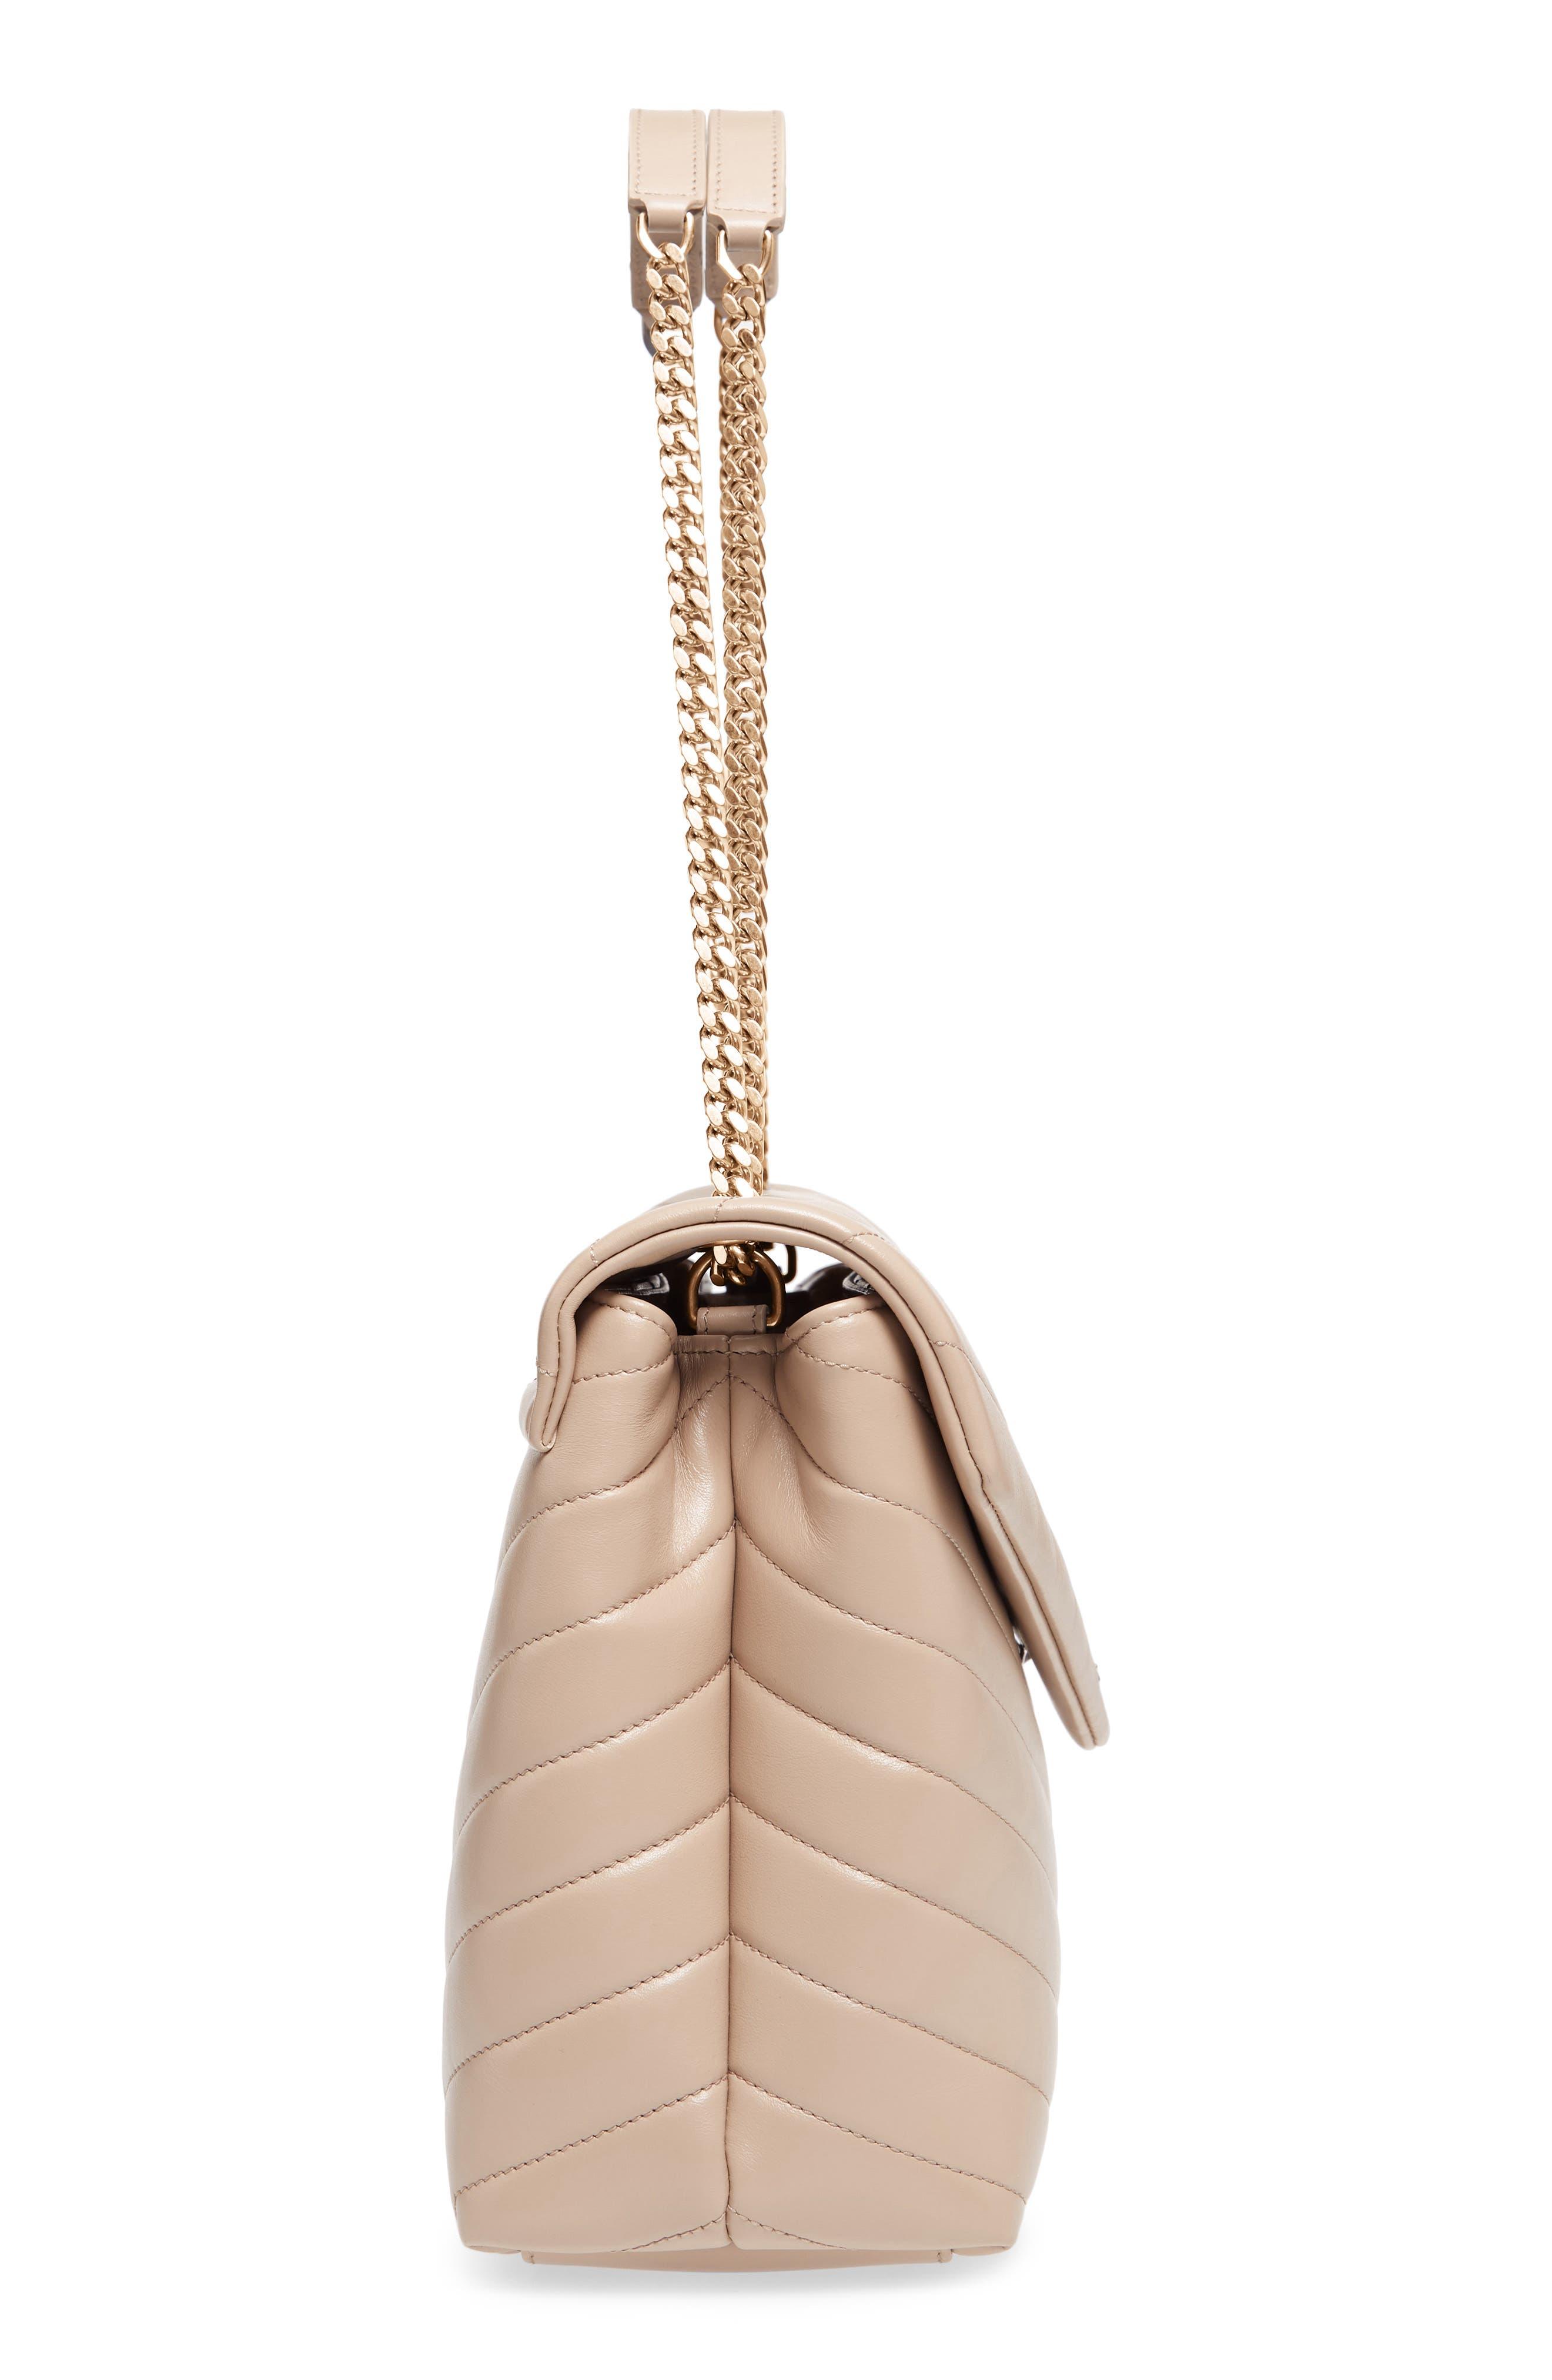 Medium Loulou Matelassé Calfskin Leather Shoulder Bag,                             Alternate thumbnail 5, color,                             LIGHT NATURAL